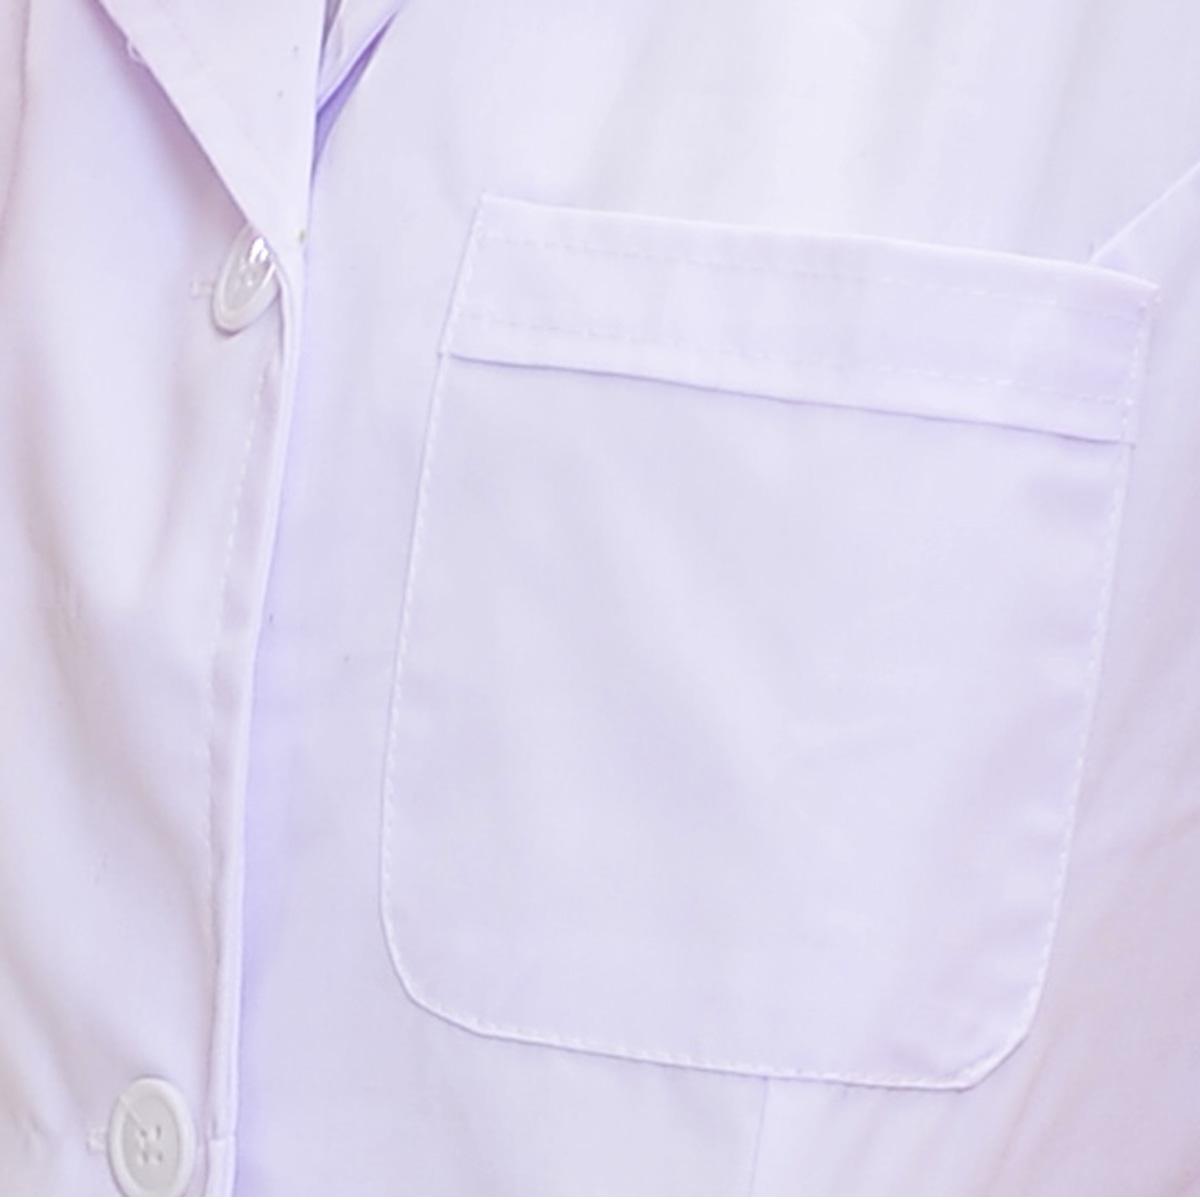 Фото медсестр под коротким халатом 12 фотография